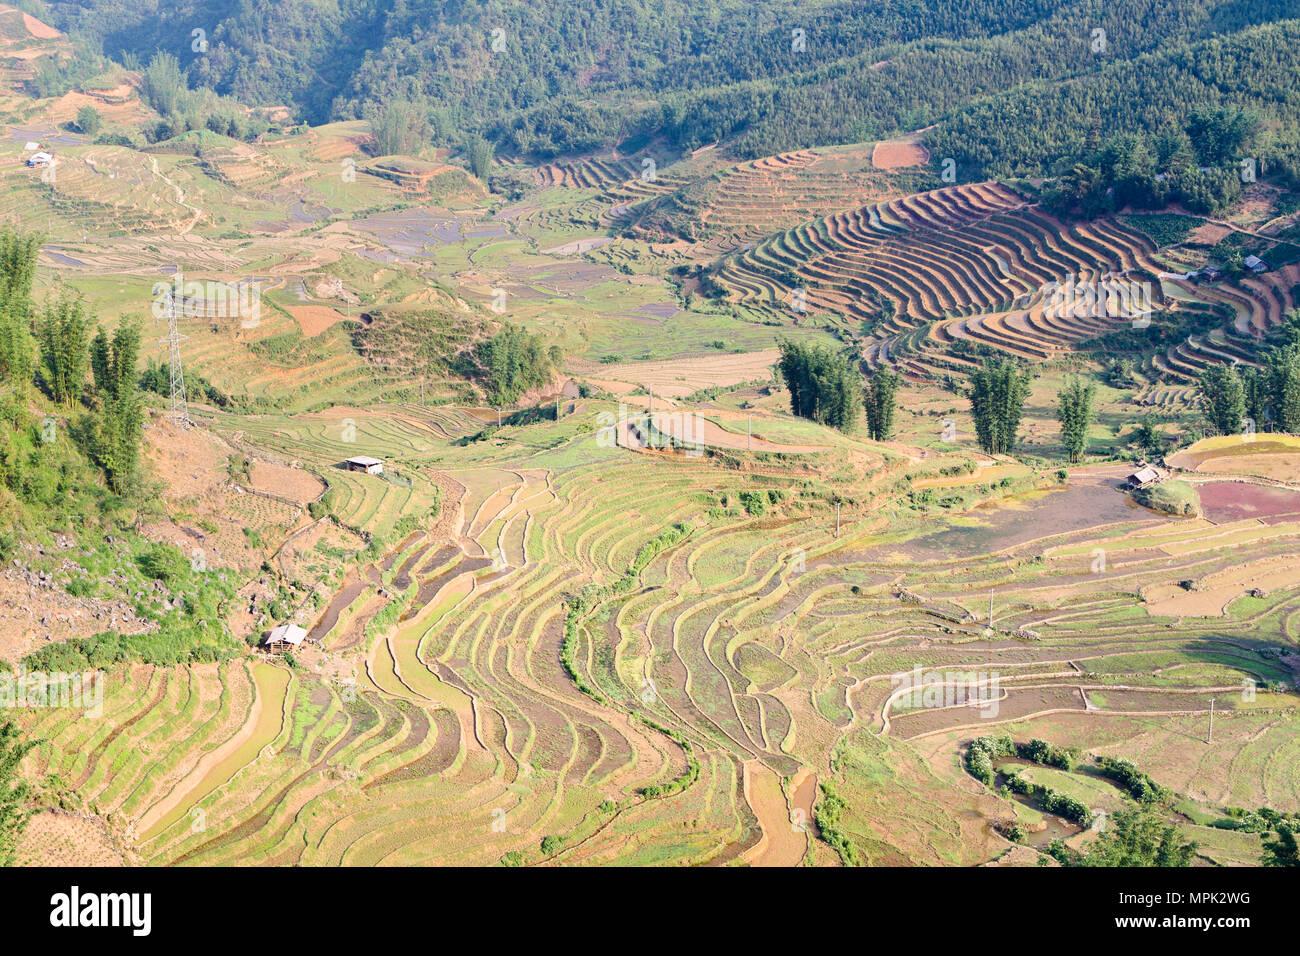 Rice terraces, Sapa, Vietnam - Stock Image